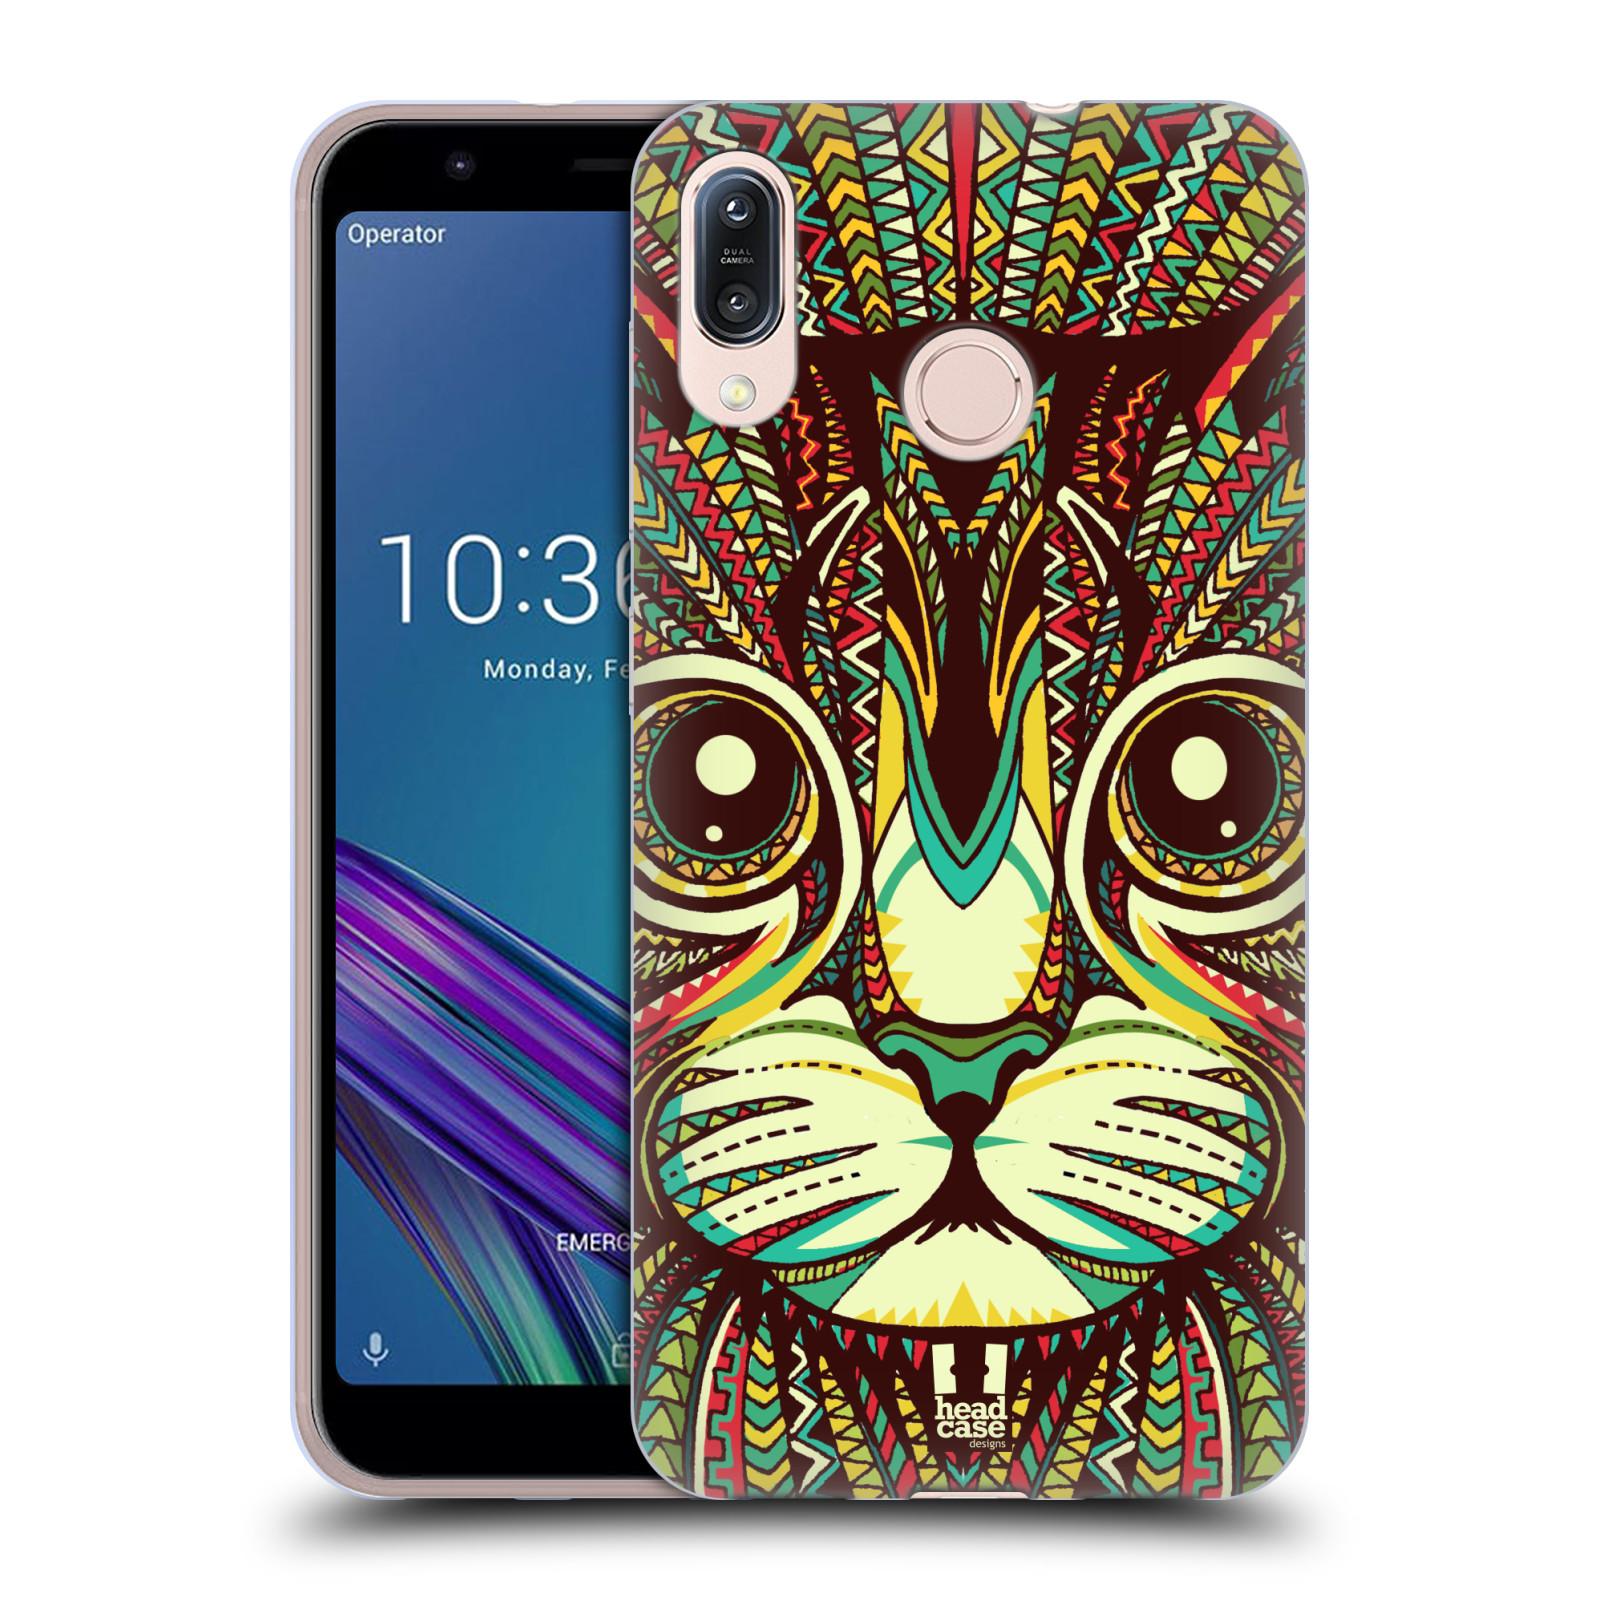 Silikonové pouzdro na mobil Asus Zenfone Max M1 ZB555KL - Head Case - AZTEC KOČKA